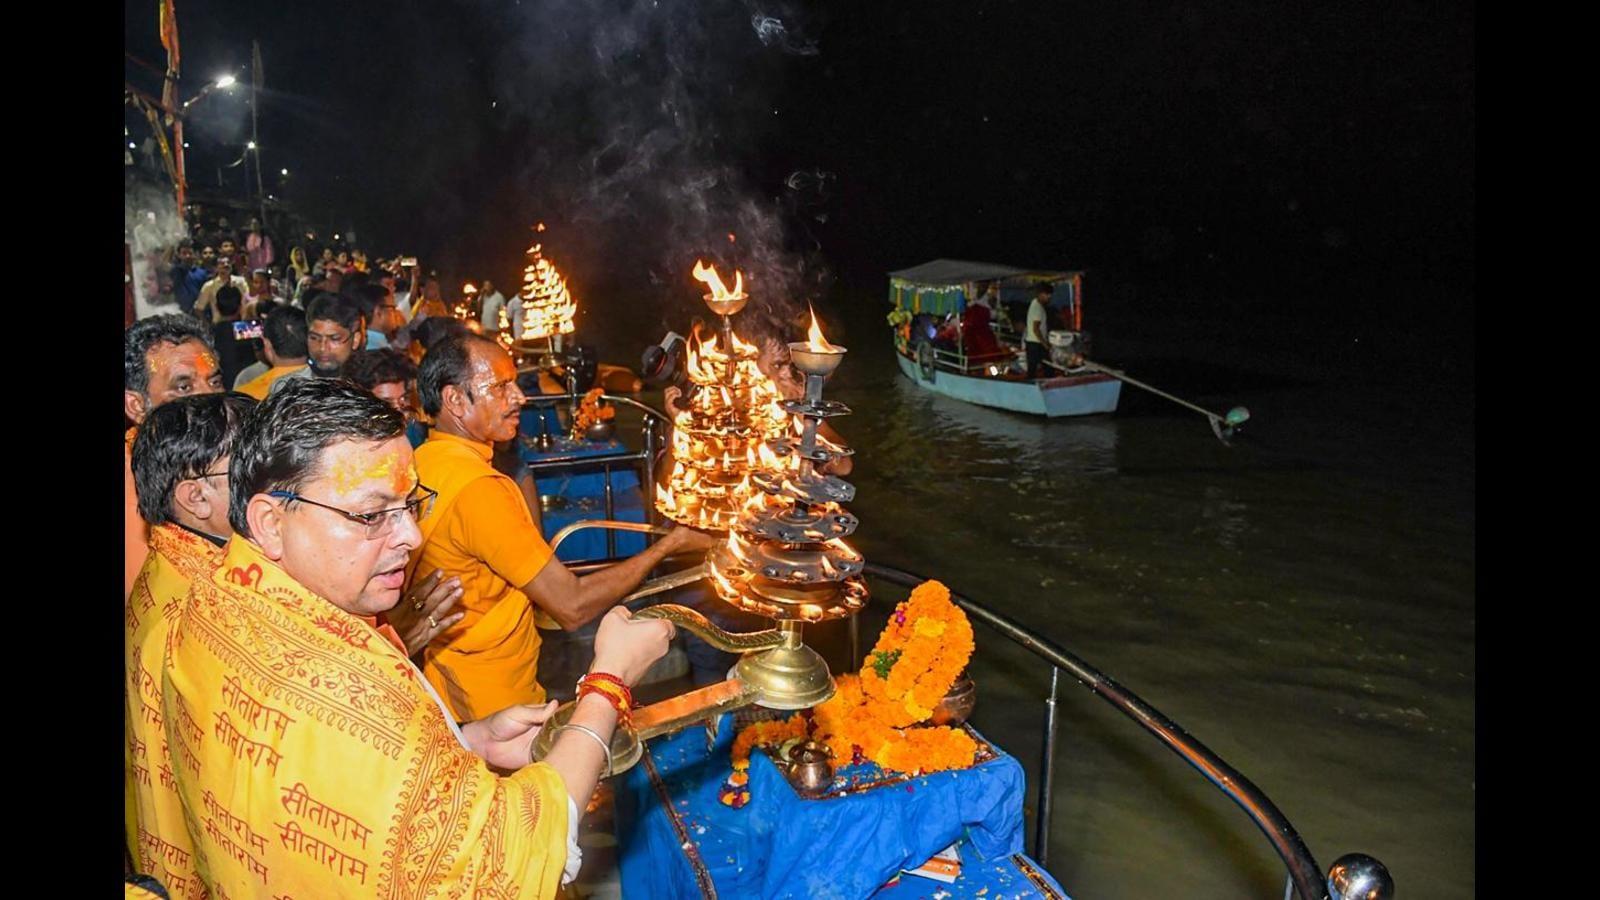 Politics and religion were never separate, says Uttarakhand CM